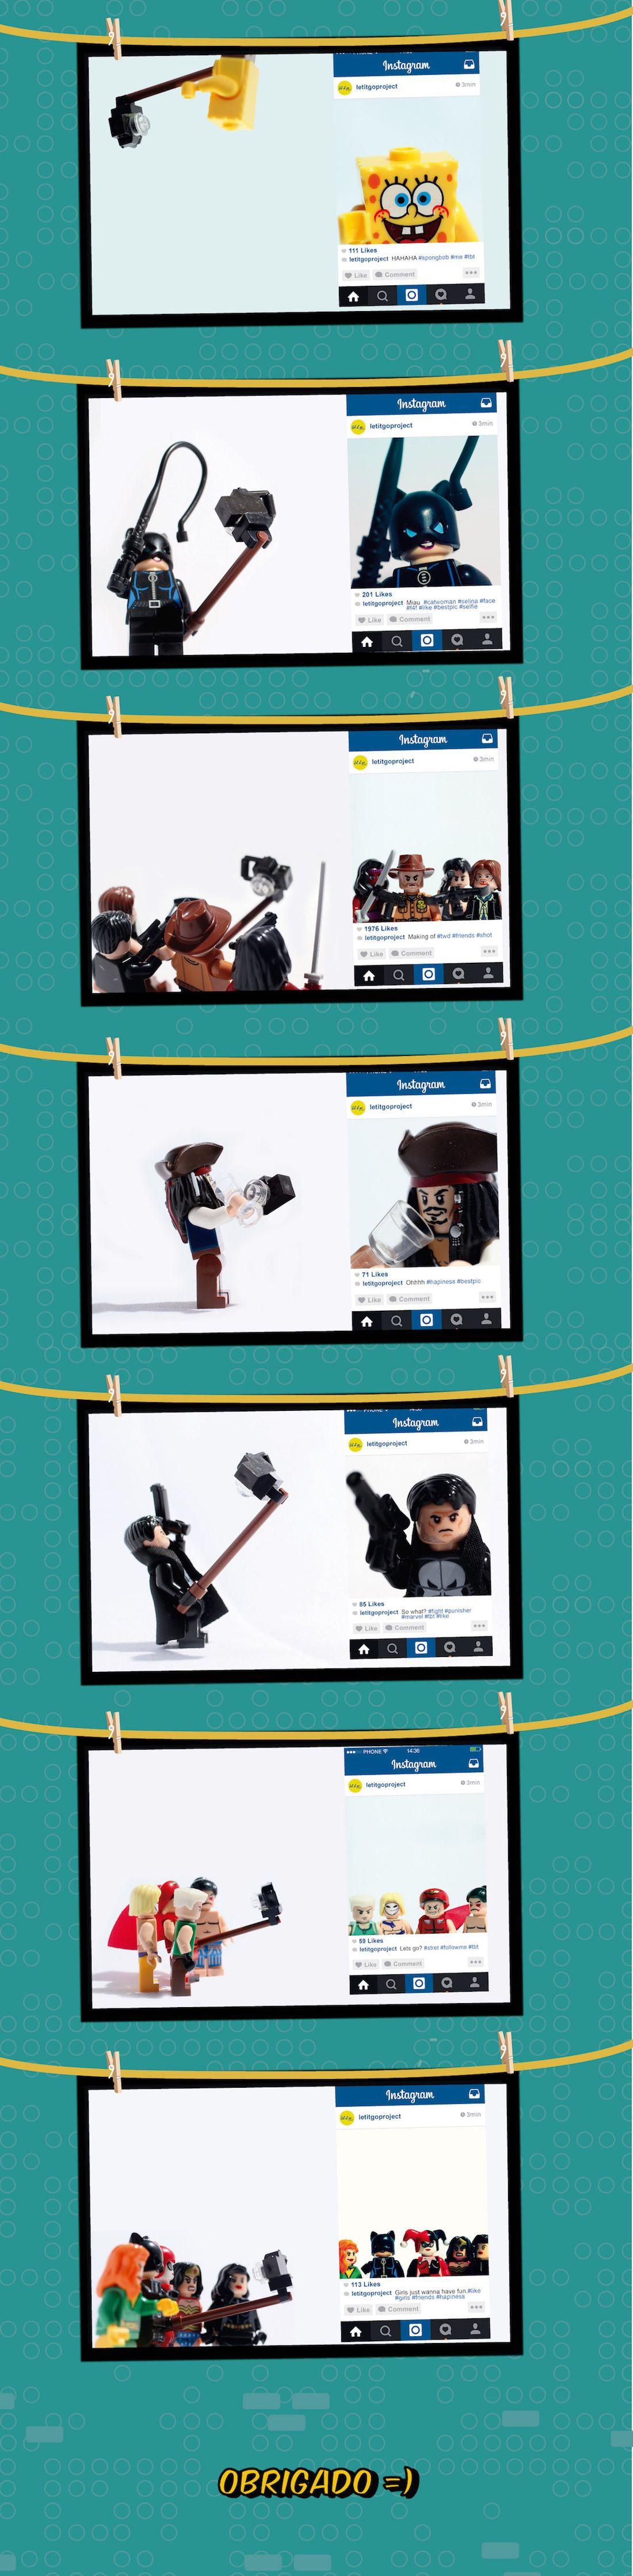 LEitGO Selfie 03